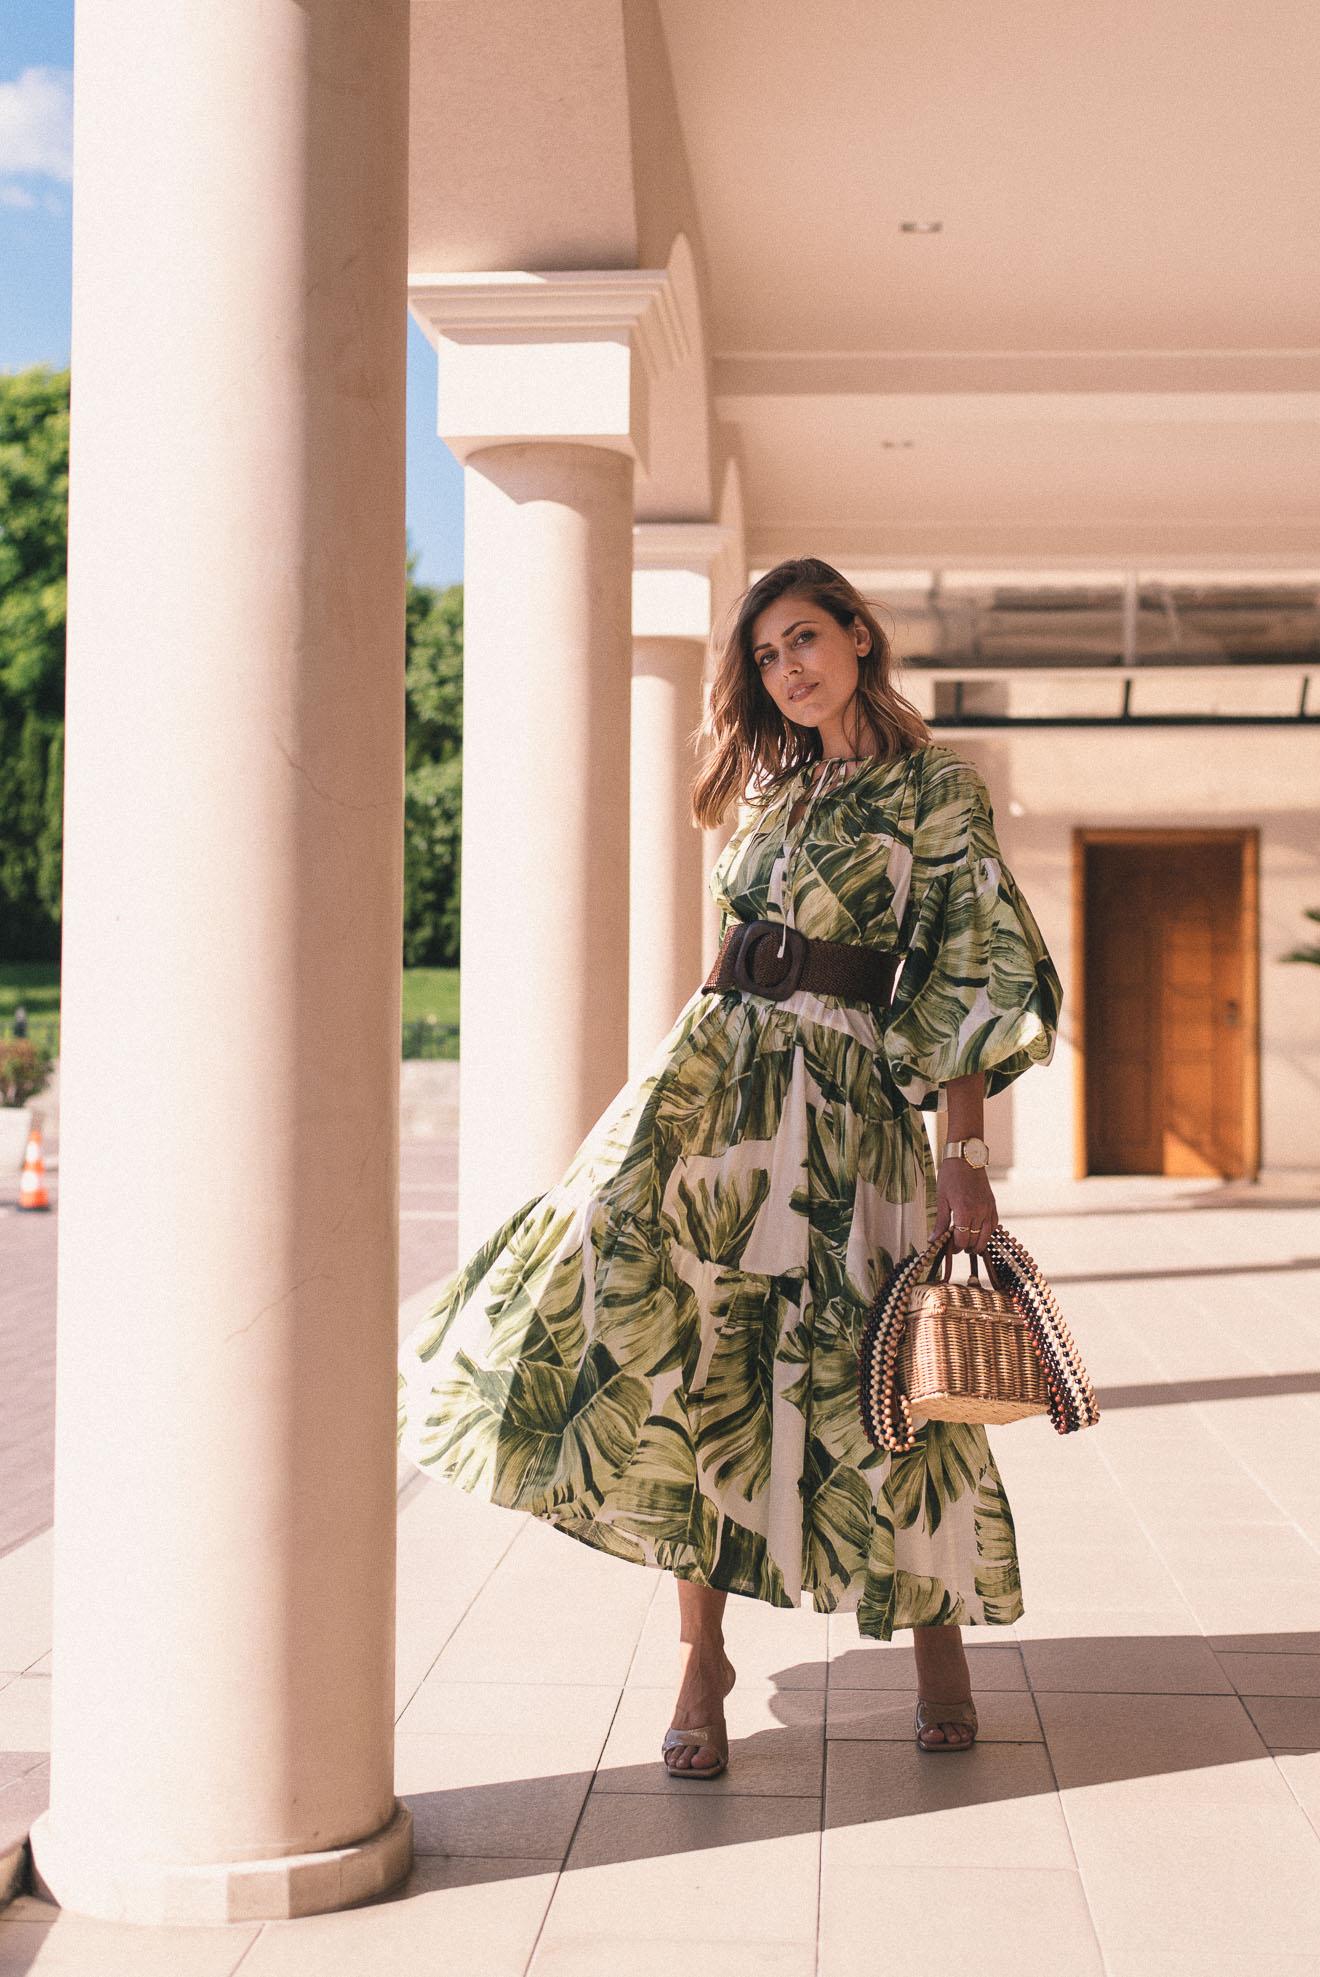 That H&M Floral dress